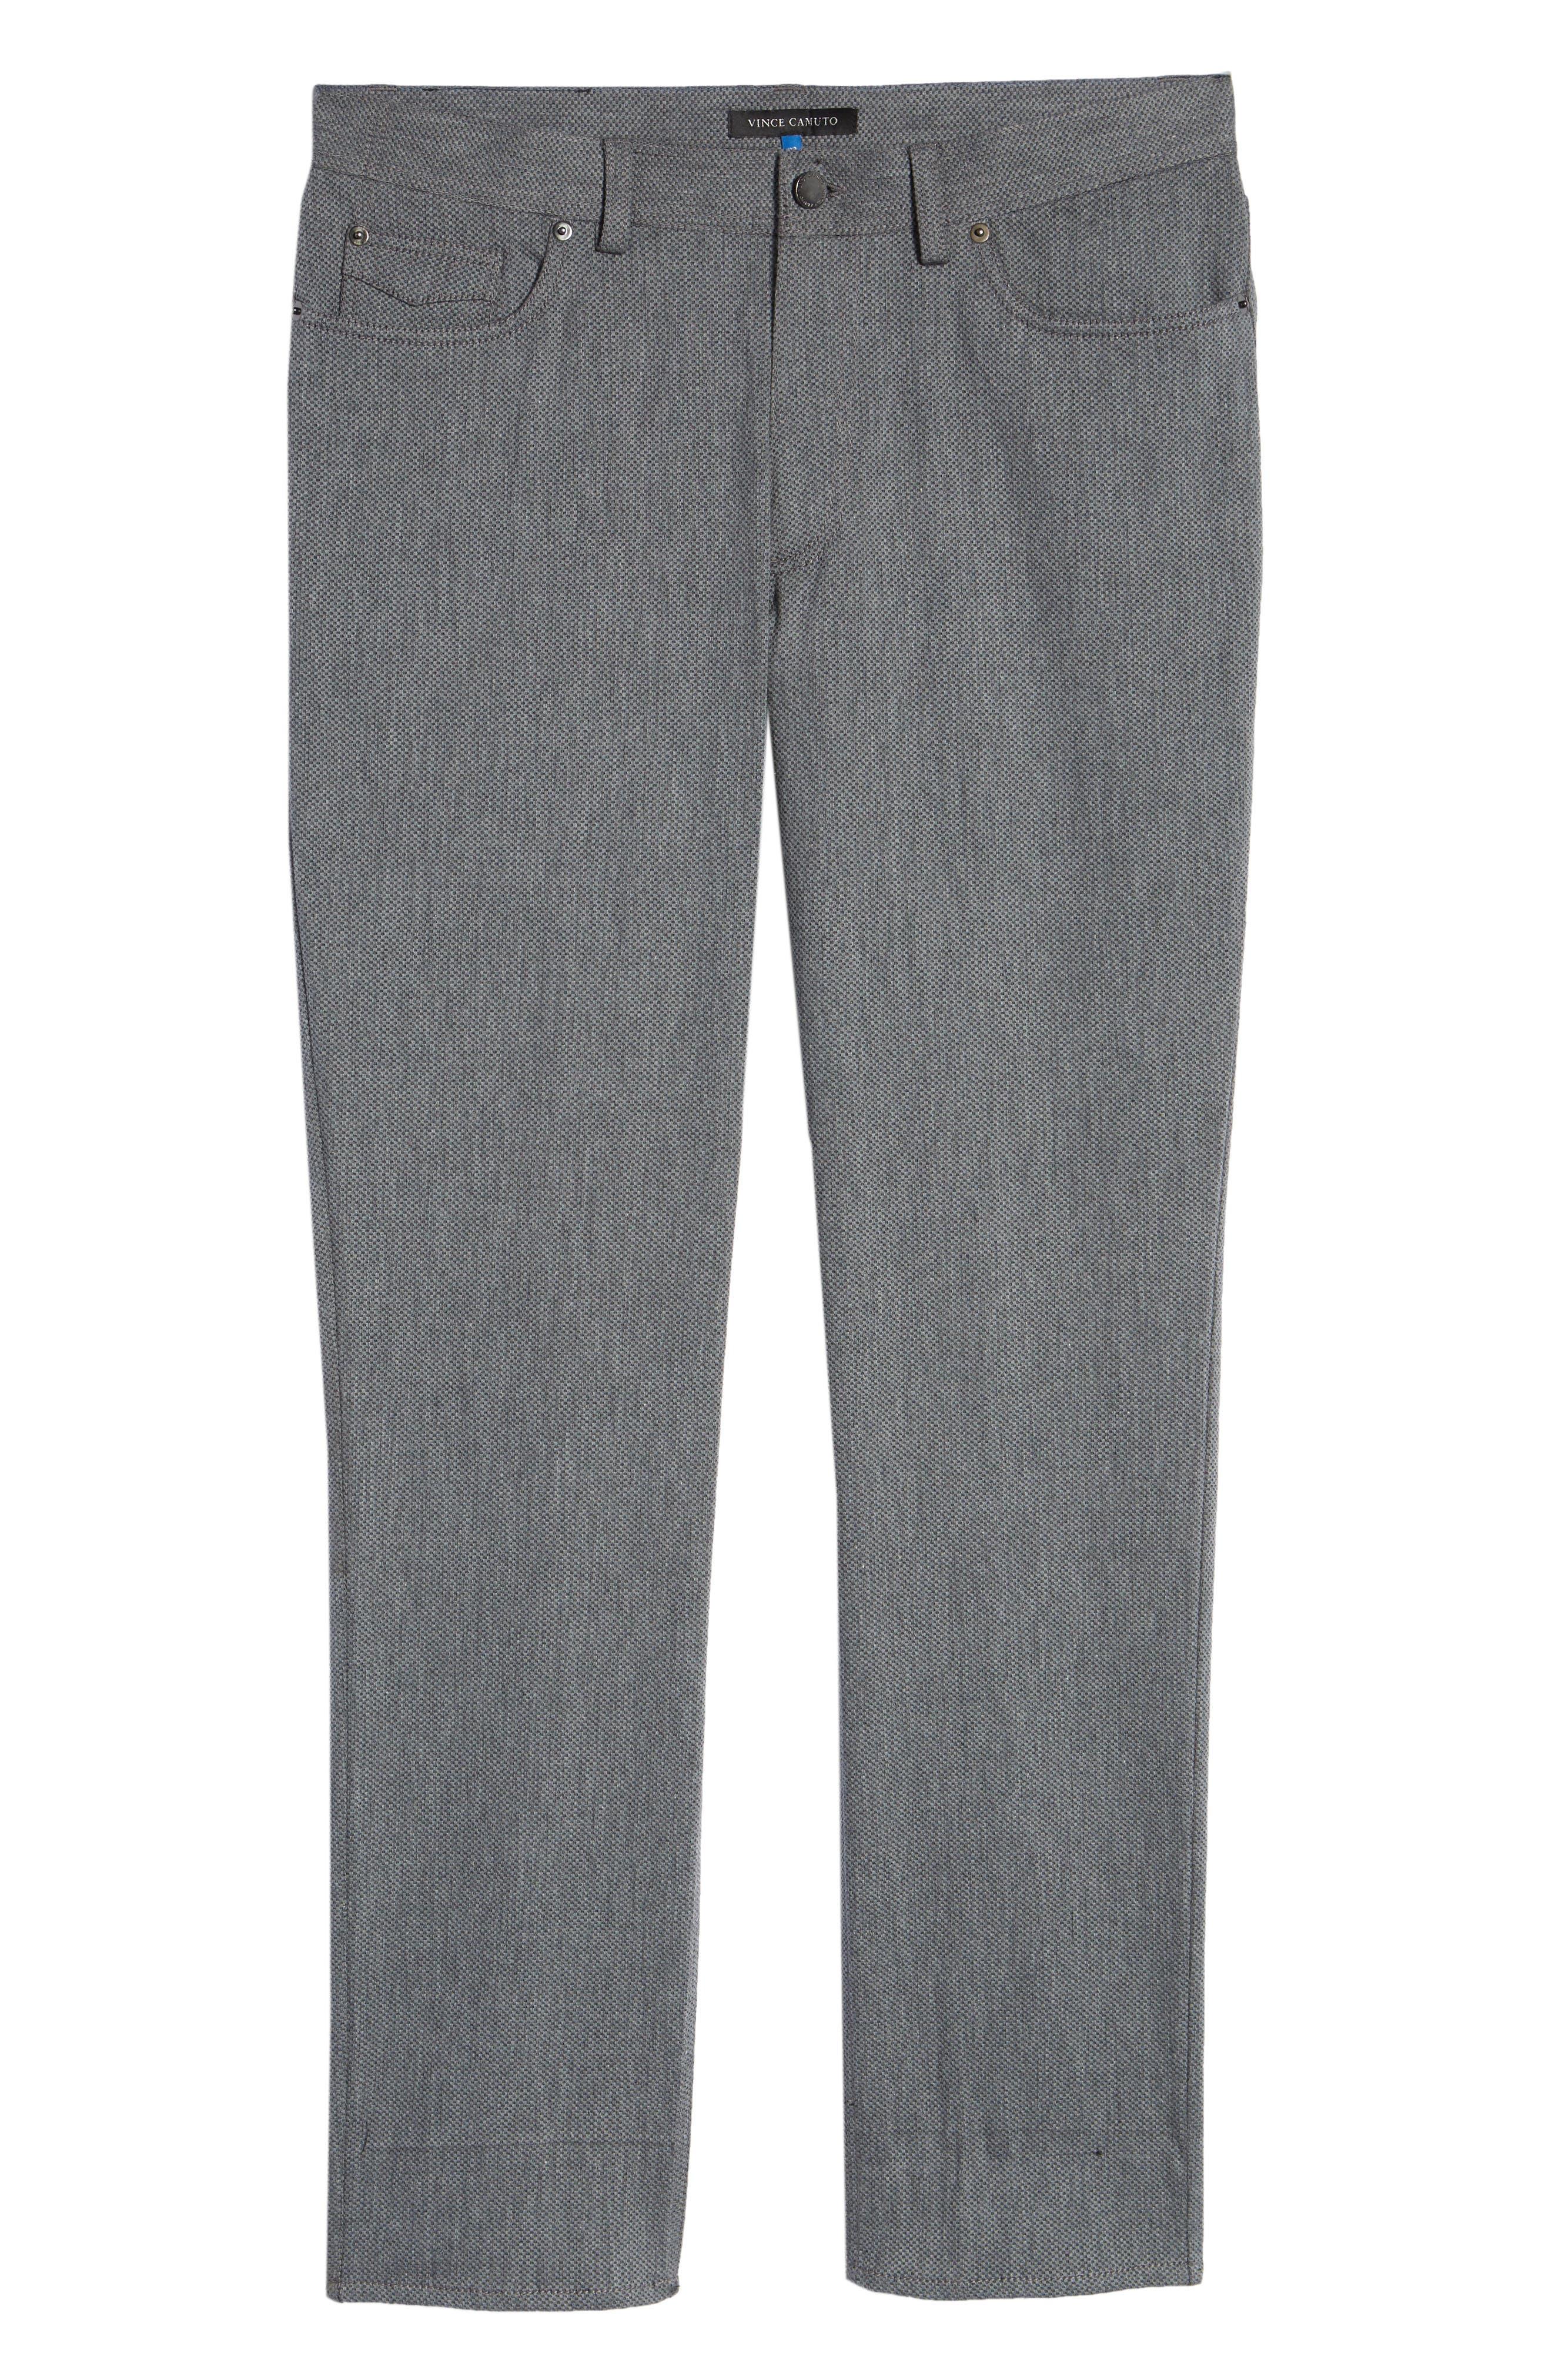 Straight Leg Five Pocket Stretch Pants,                             Alternate thumbnail 6, color,                             HEATHER CHARCOAL CROSSHATCH